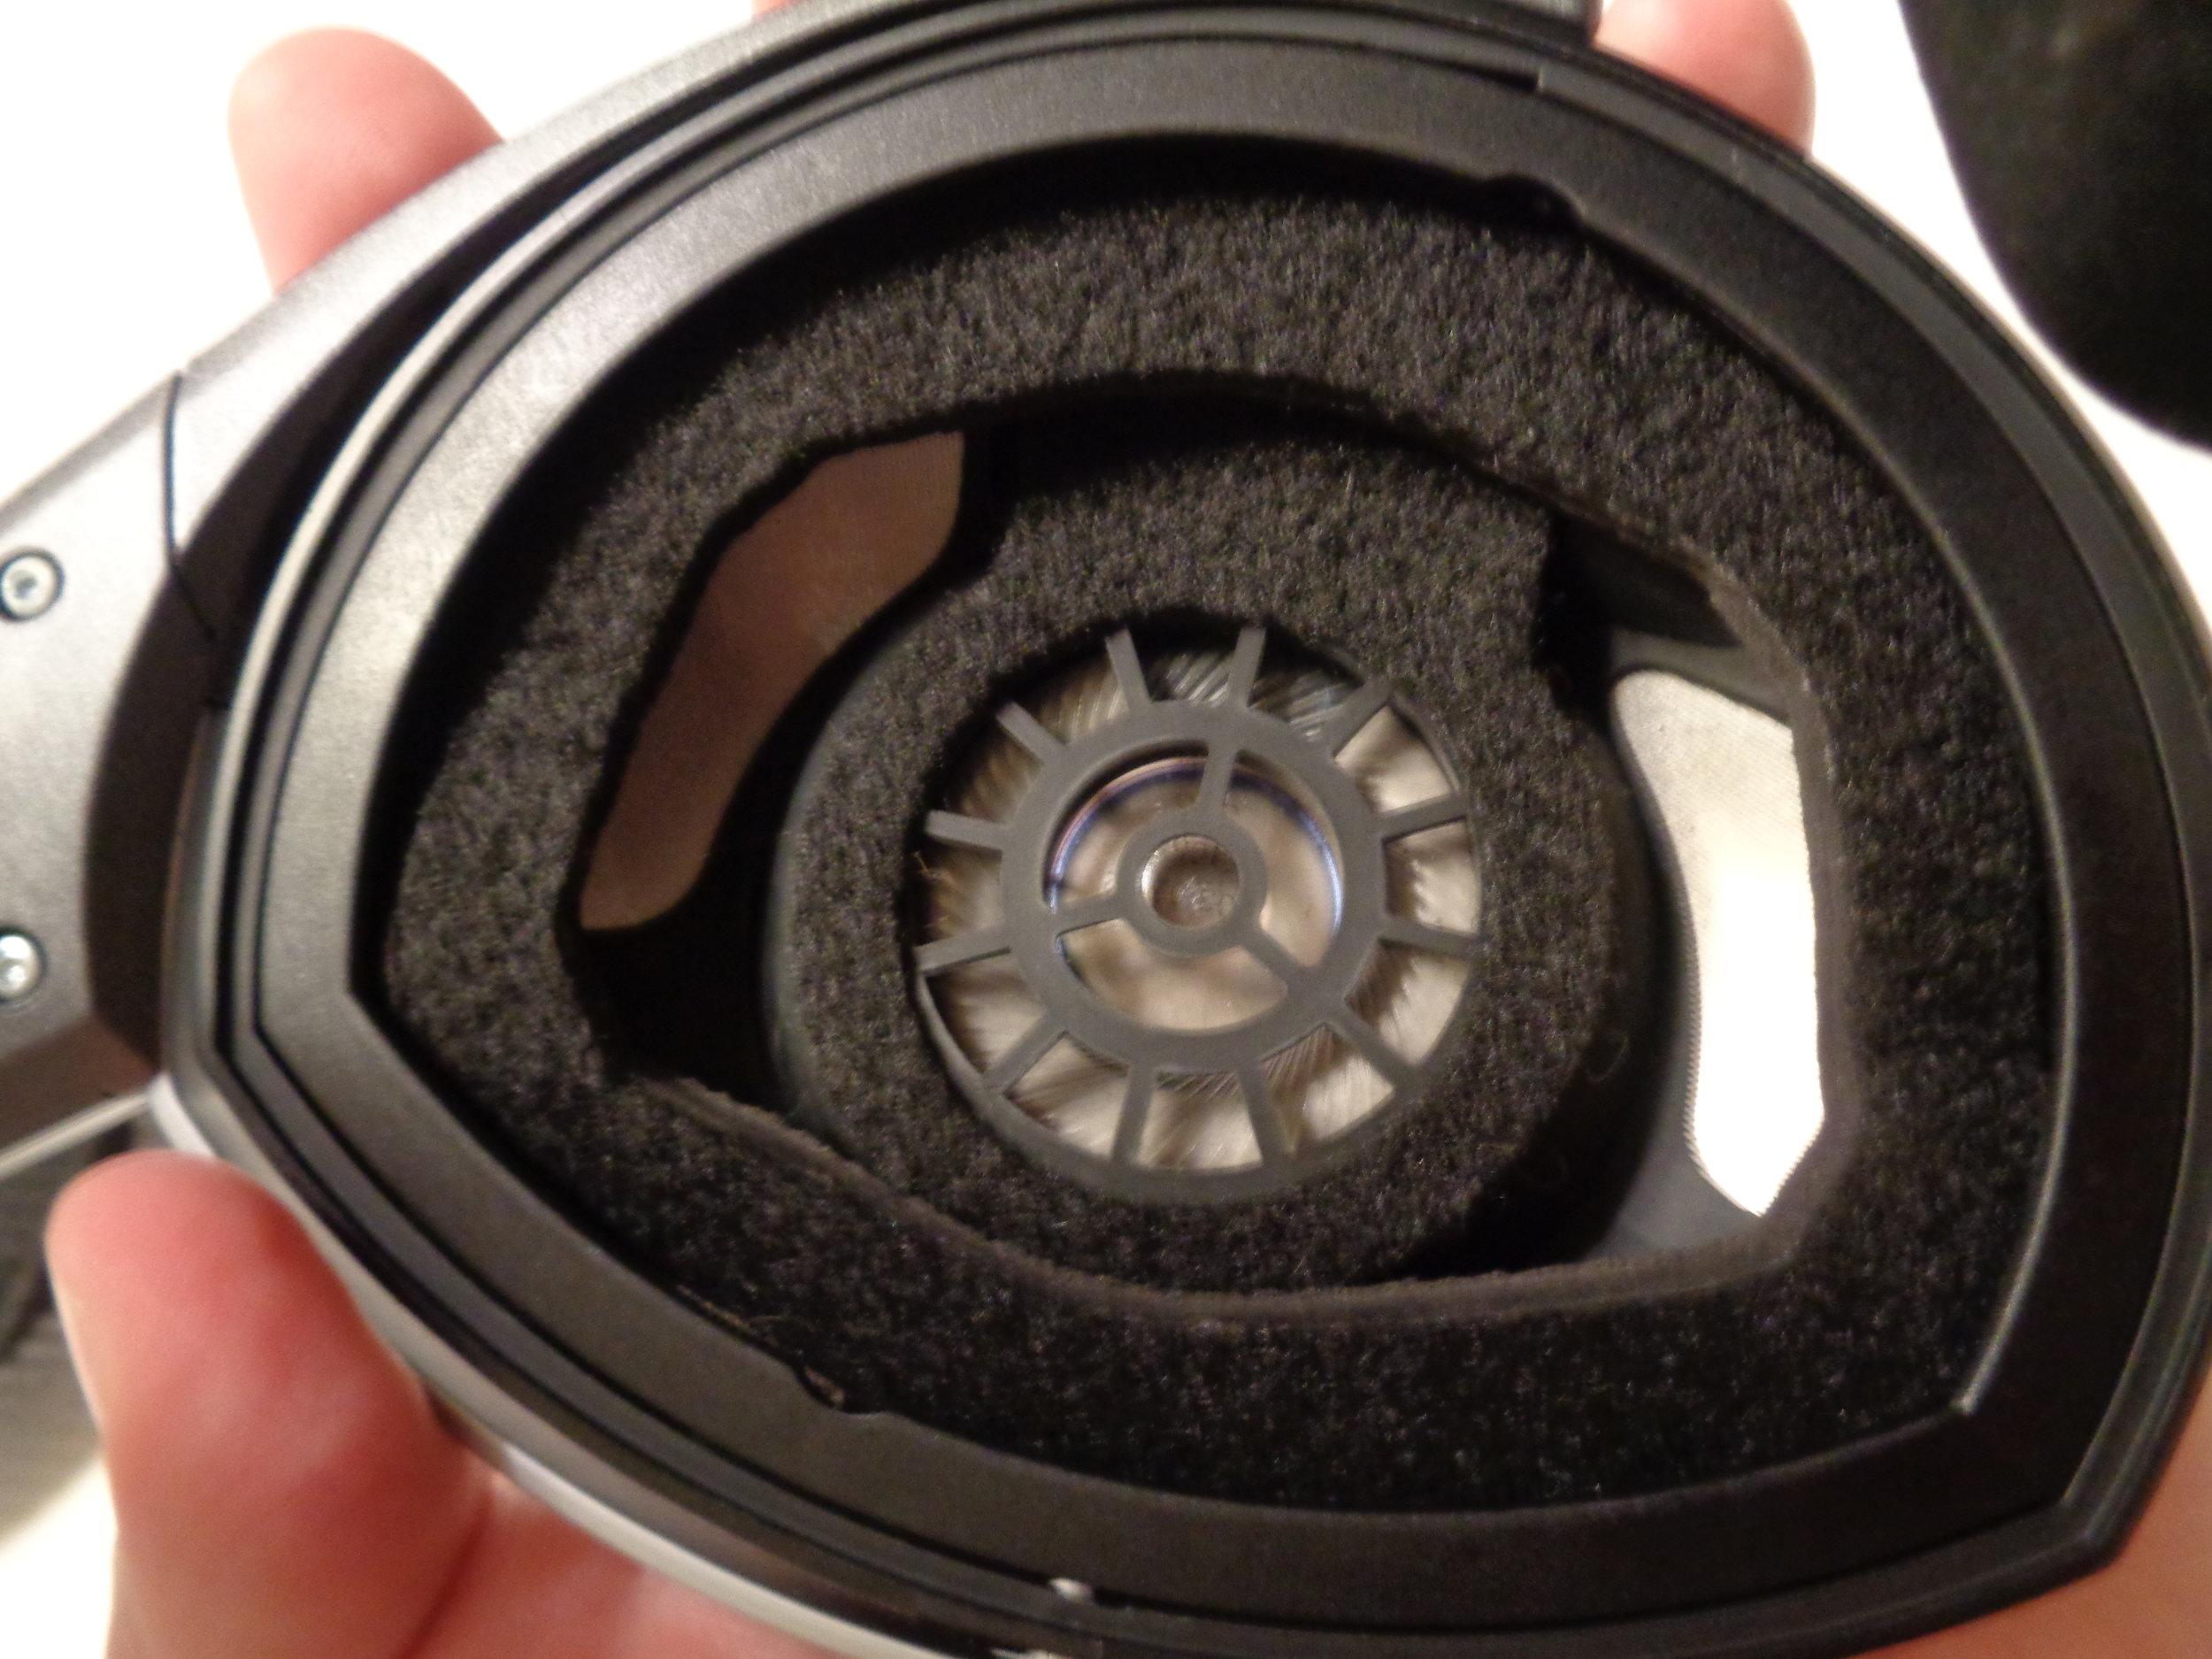 HD700 Mod Kit — Mod House Audio